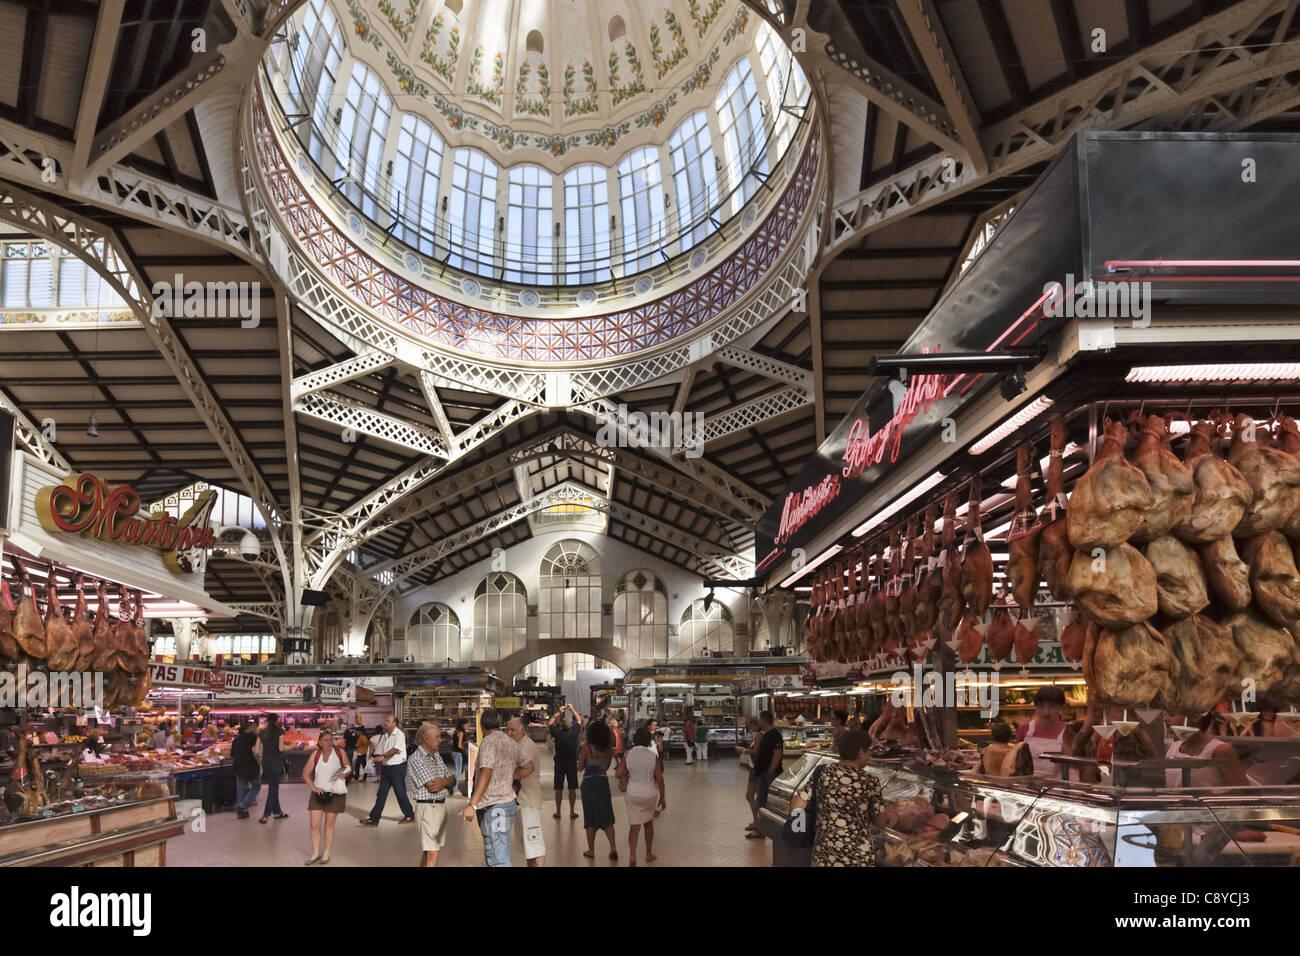 Central market hall , Mercado Central, Valencia, Spain Stock Photo, Royalty F...